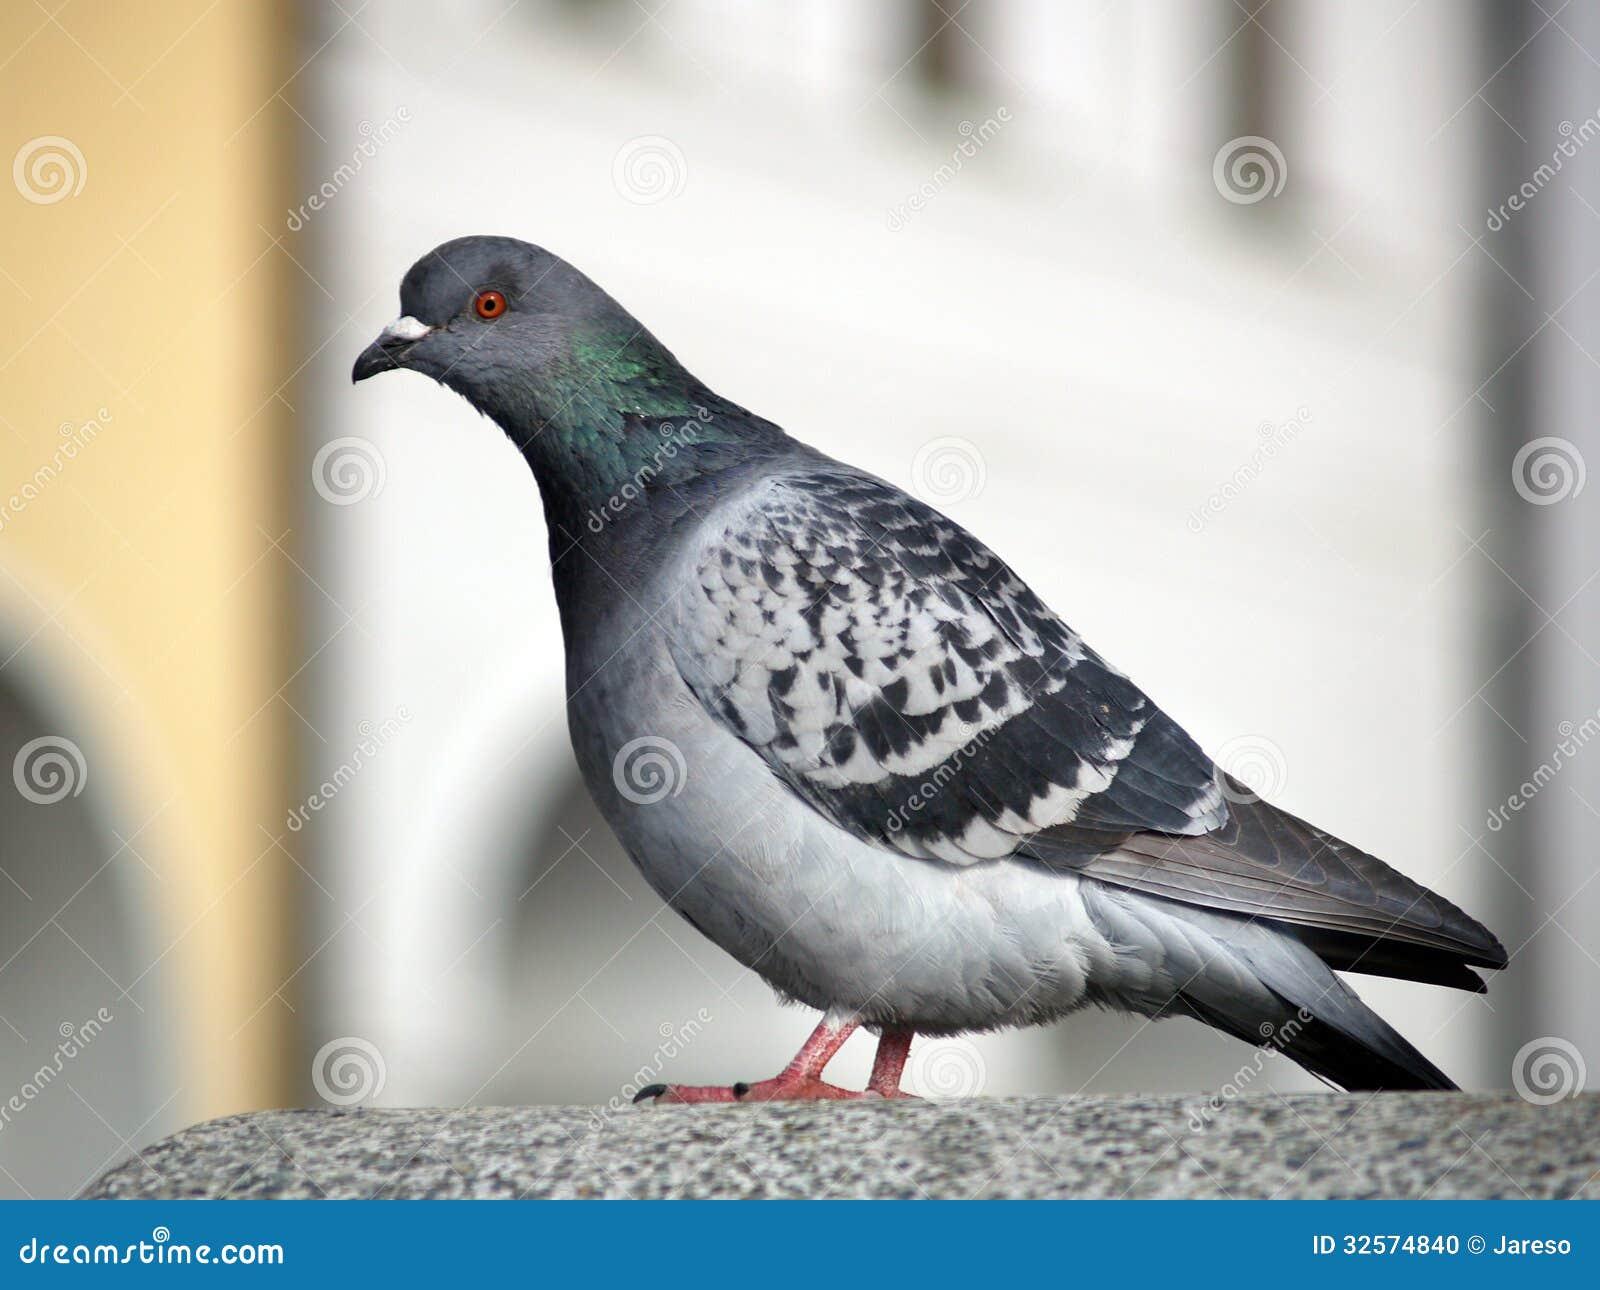 Rock Dove or Common Pigeon